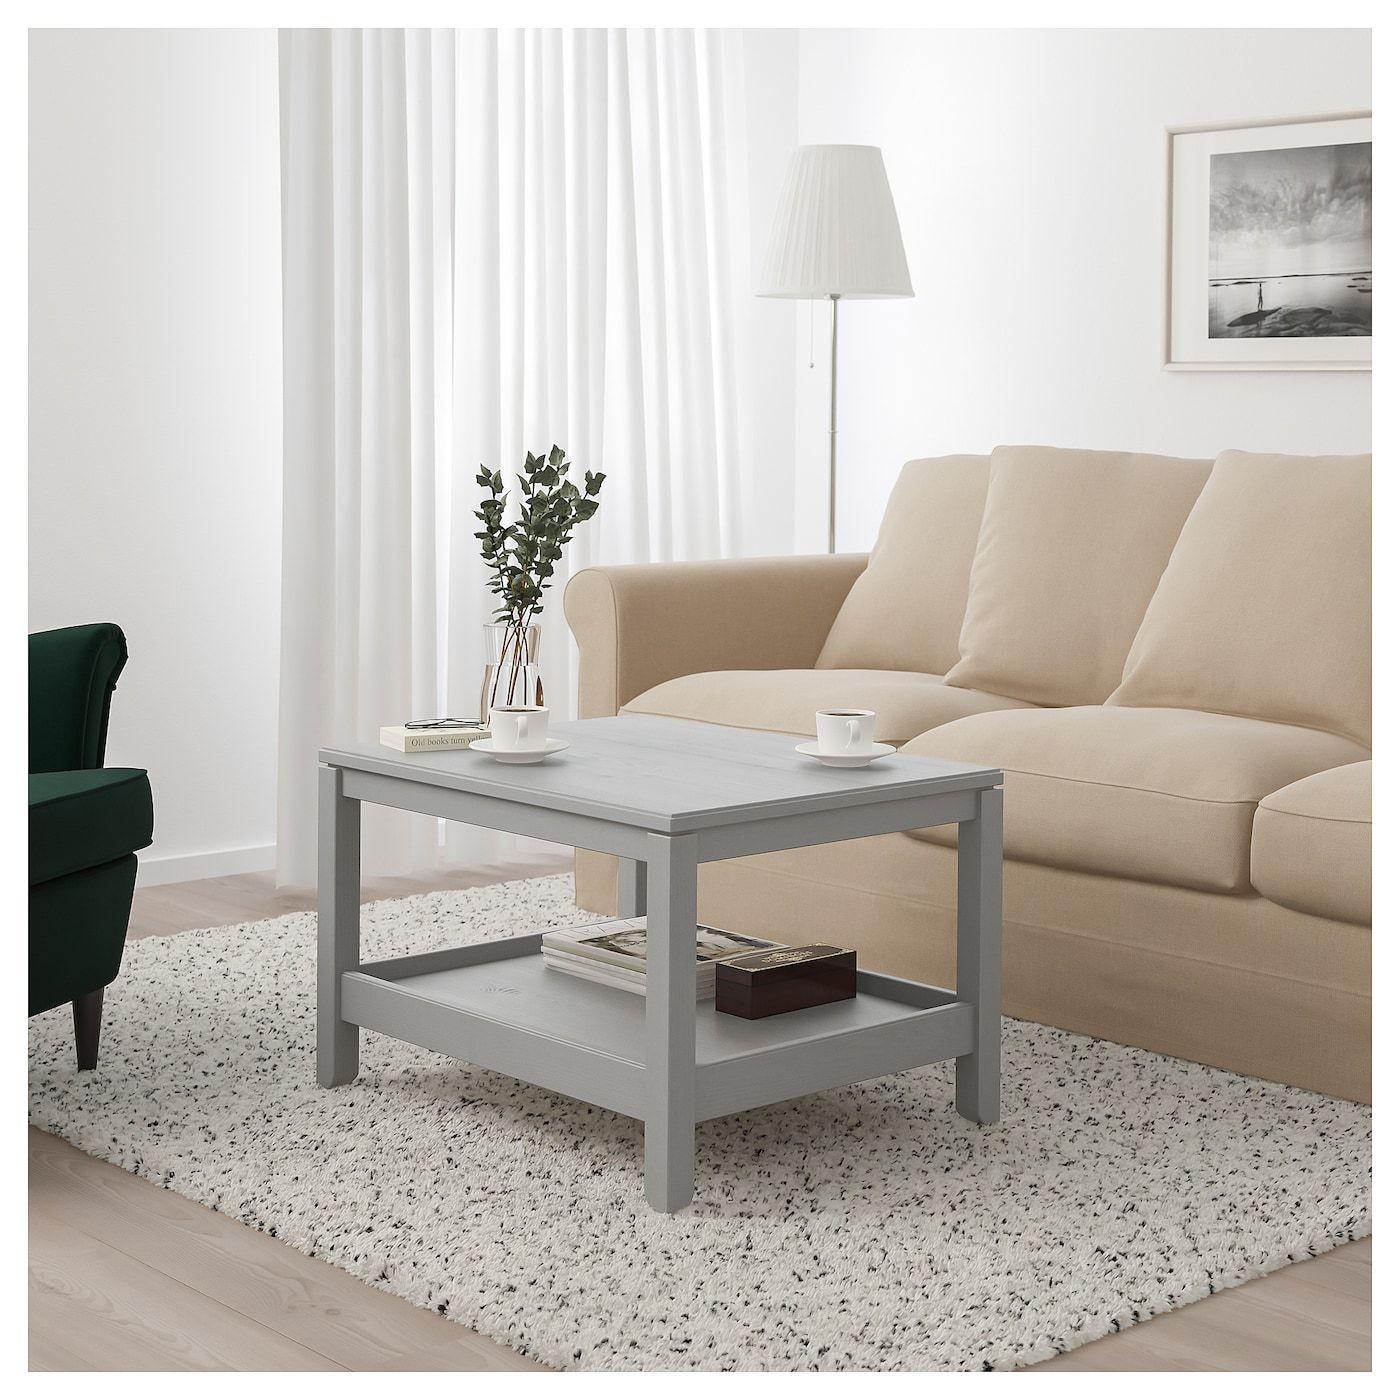 Couchtisch Grau Ikea